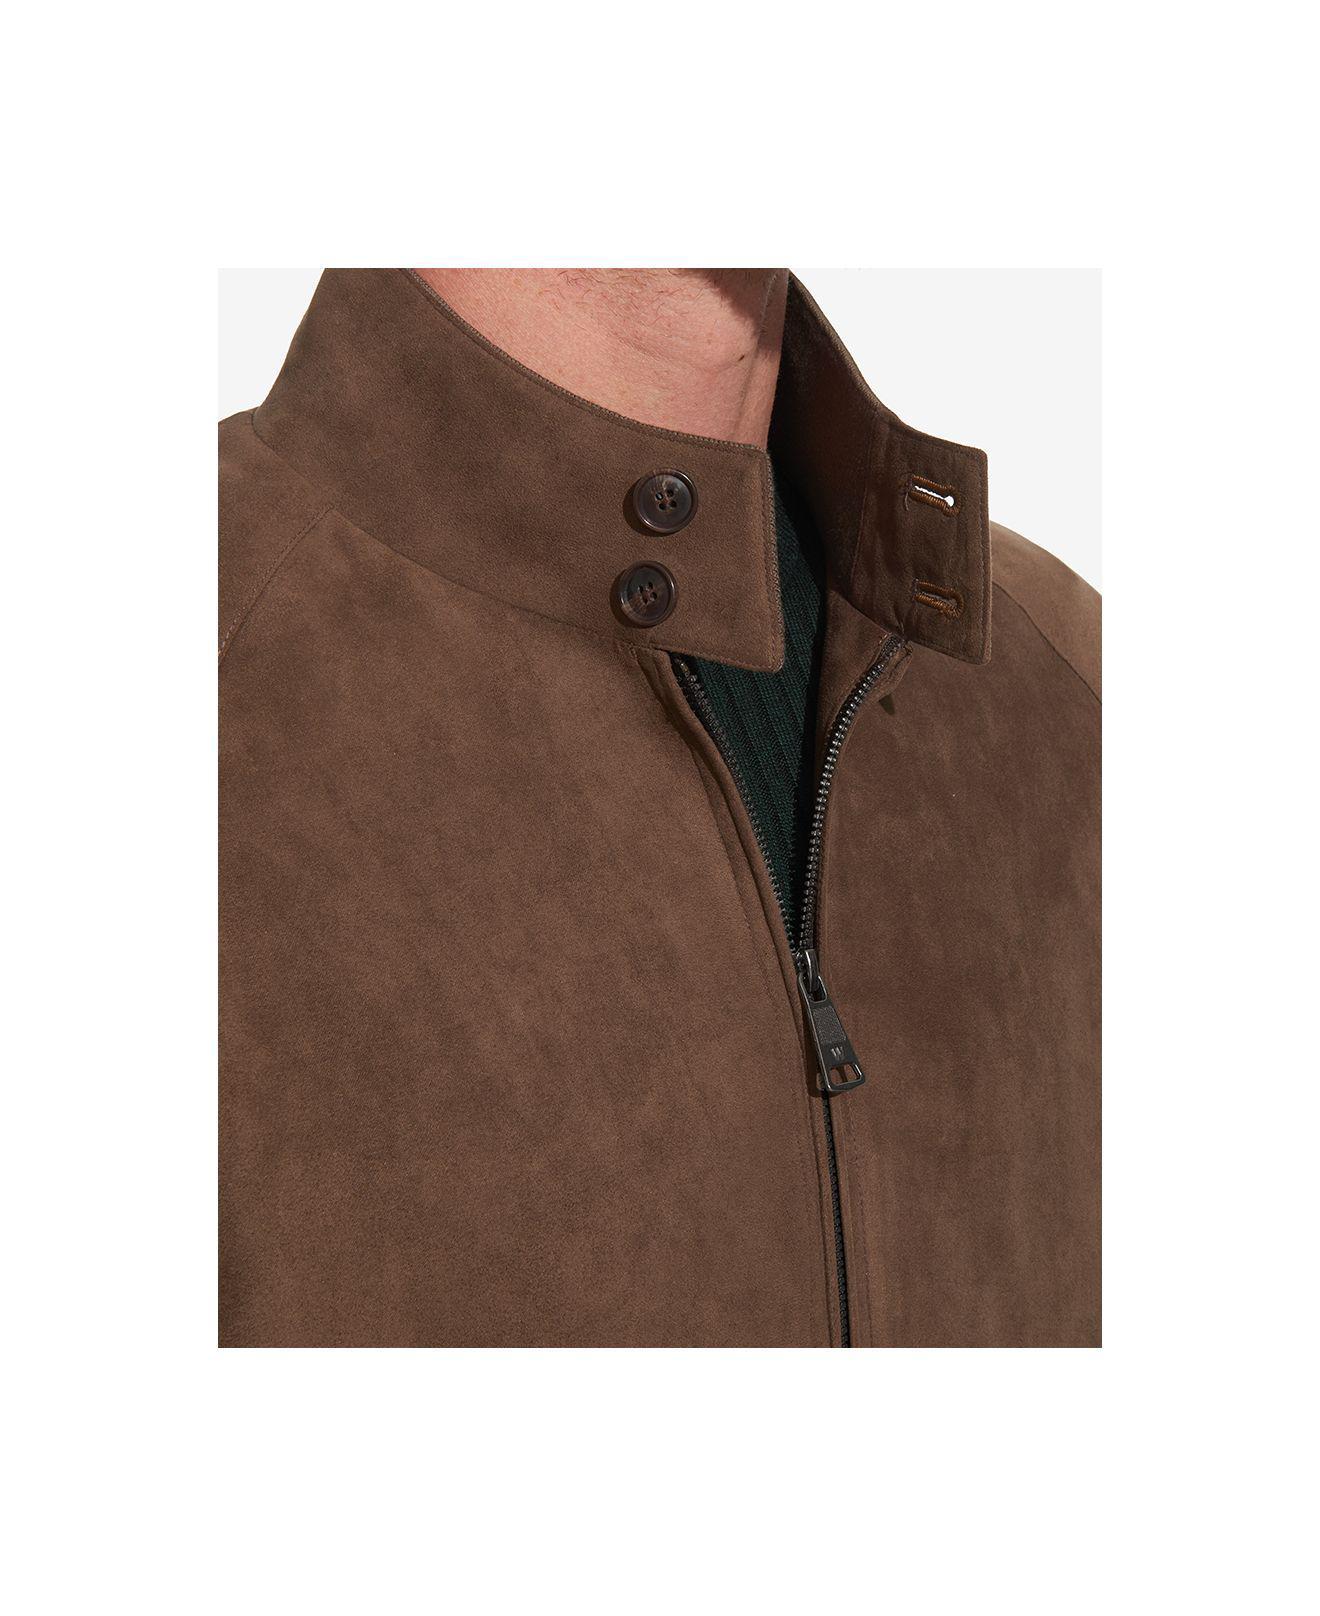 160829a91 Weatherproof Faux-suede Full-zip Bomber Jacket in Brown for Men - Lyst